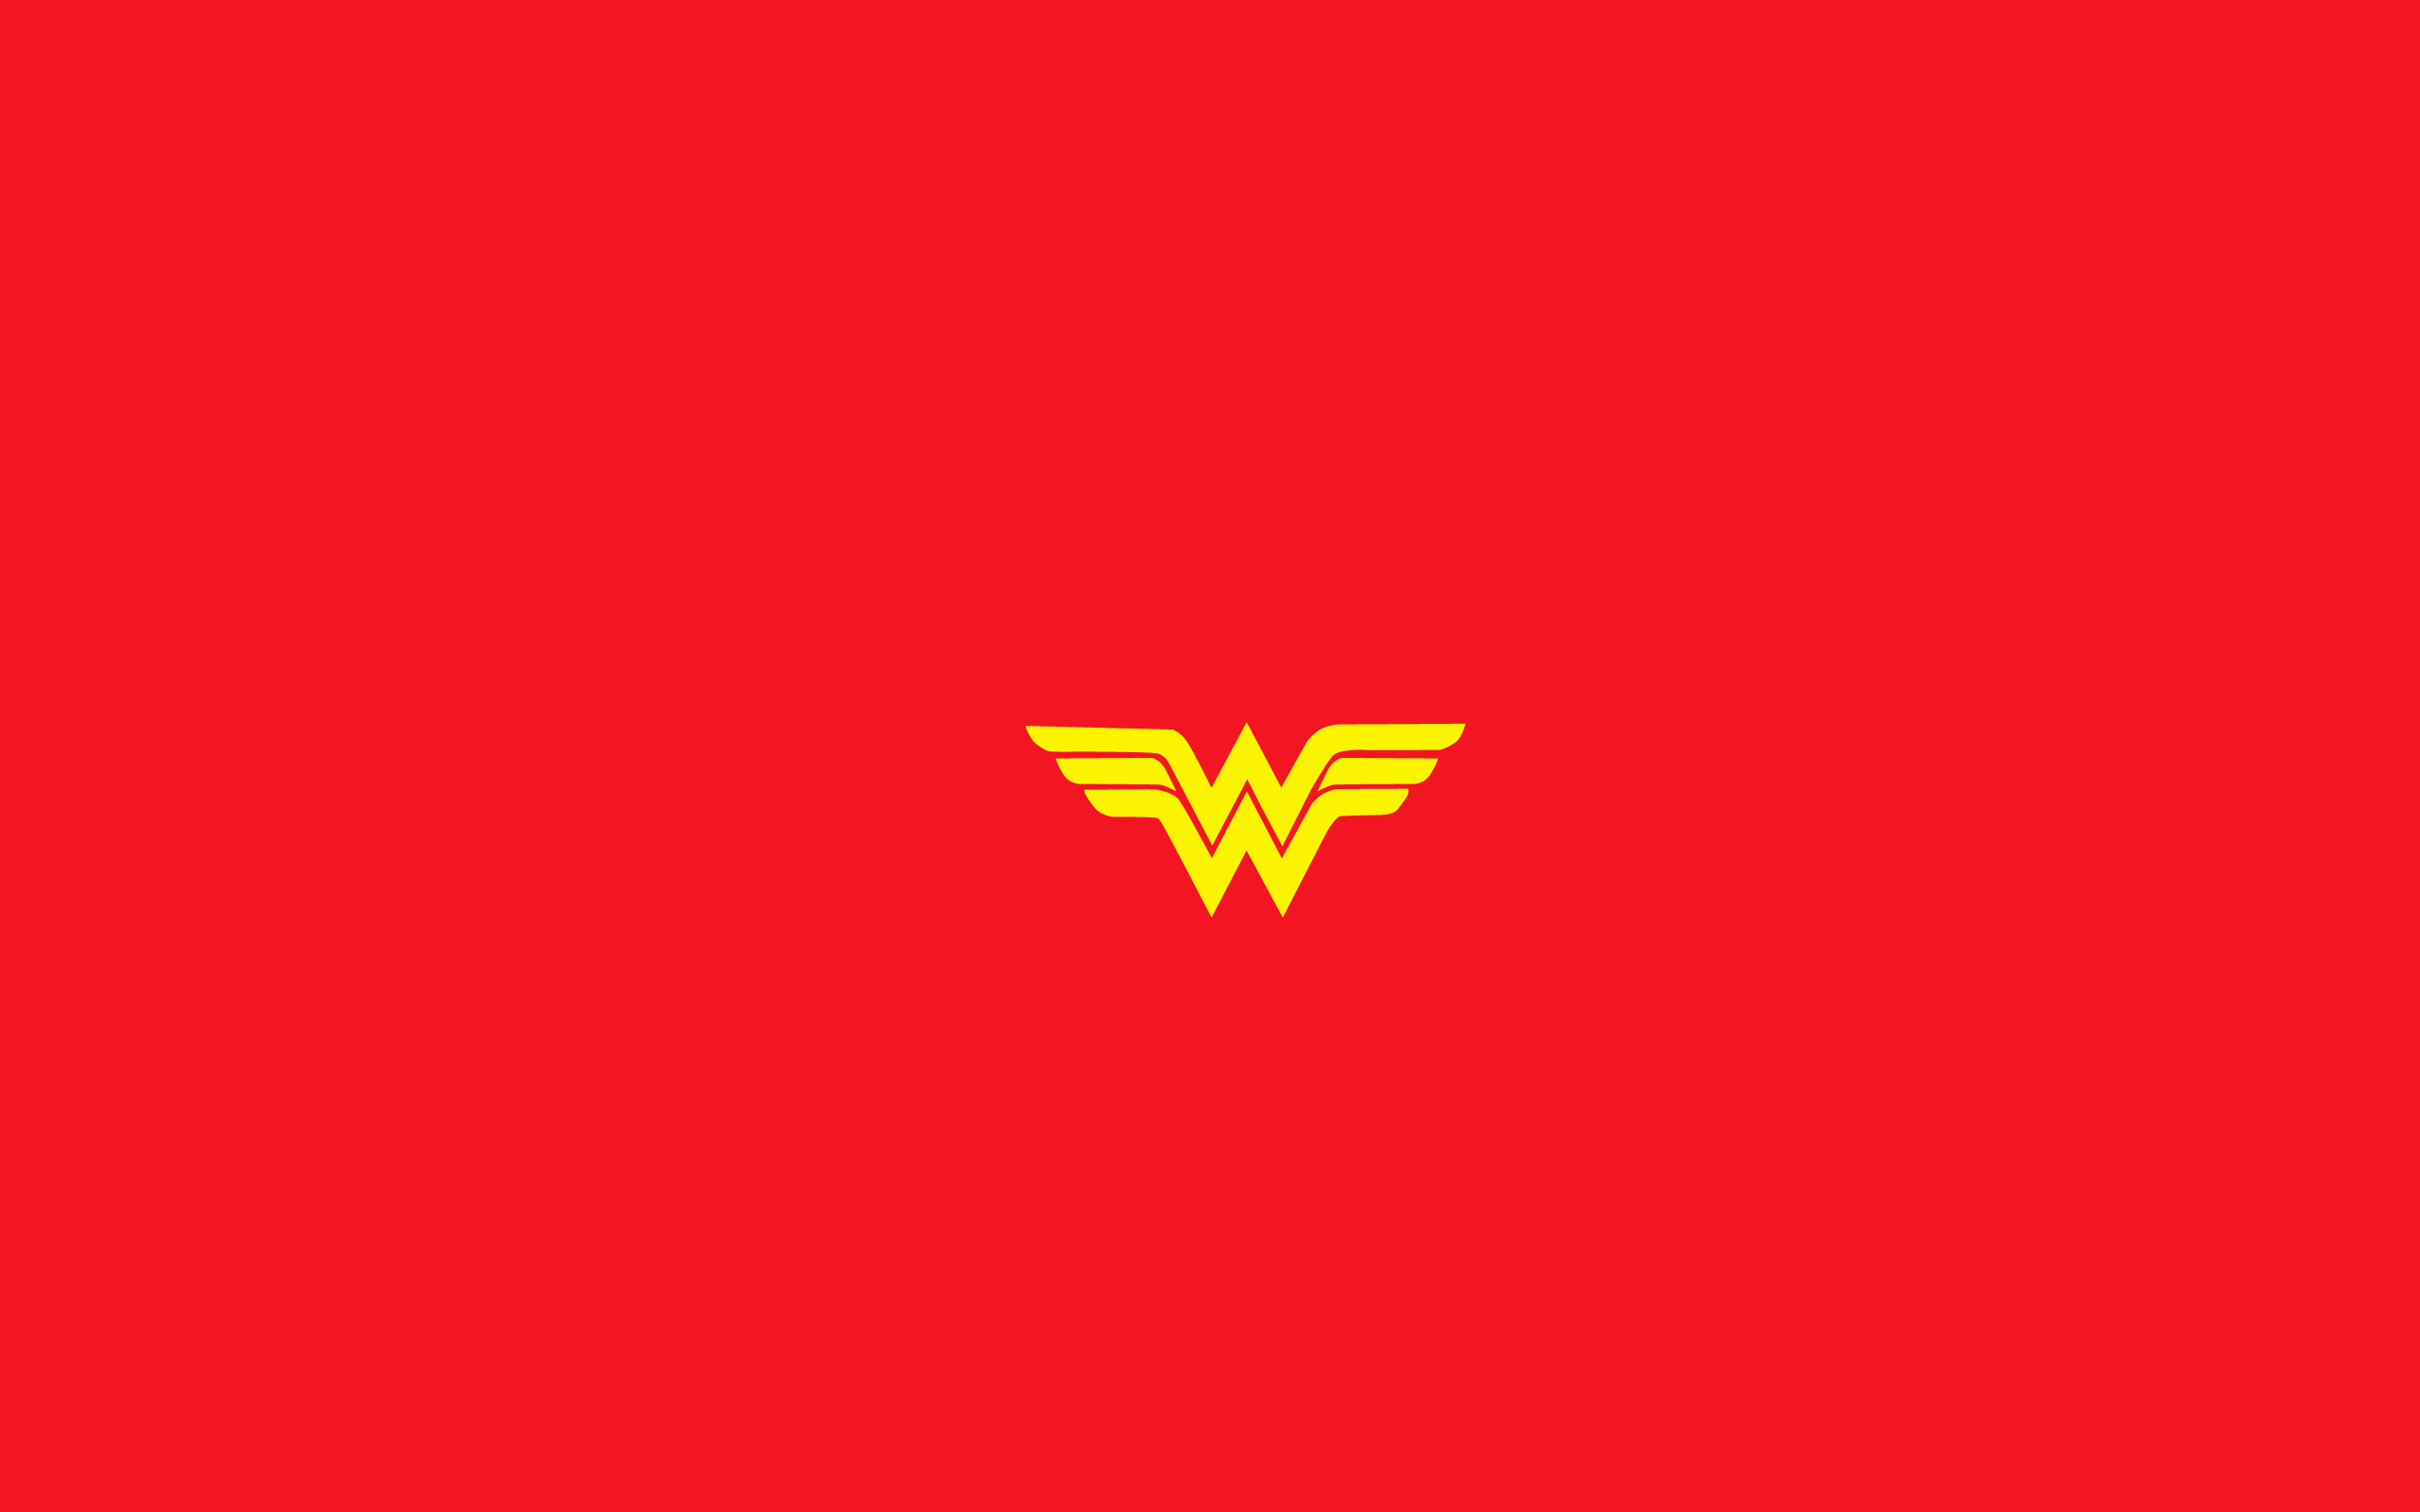 Wonder Woman Logo Wallpapers 2560x1600